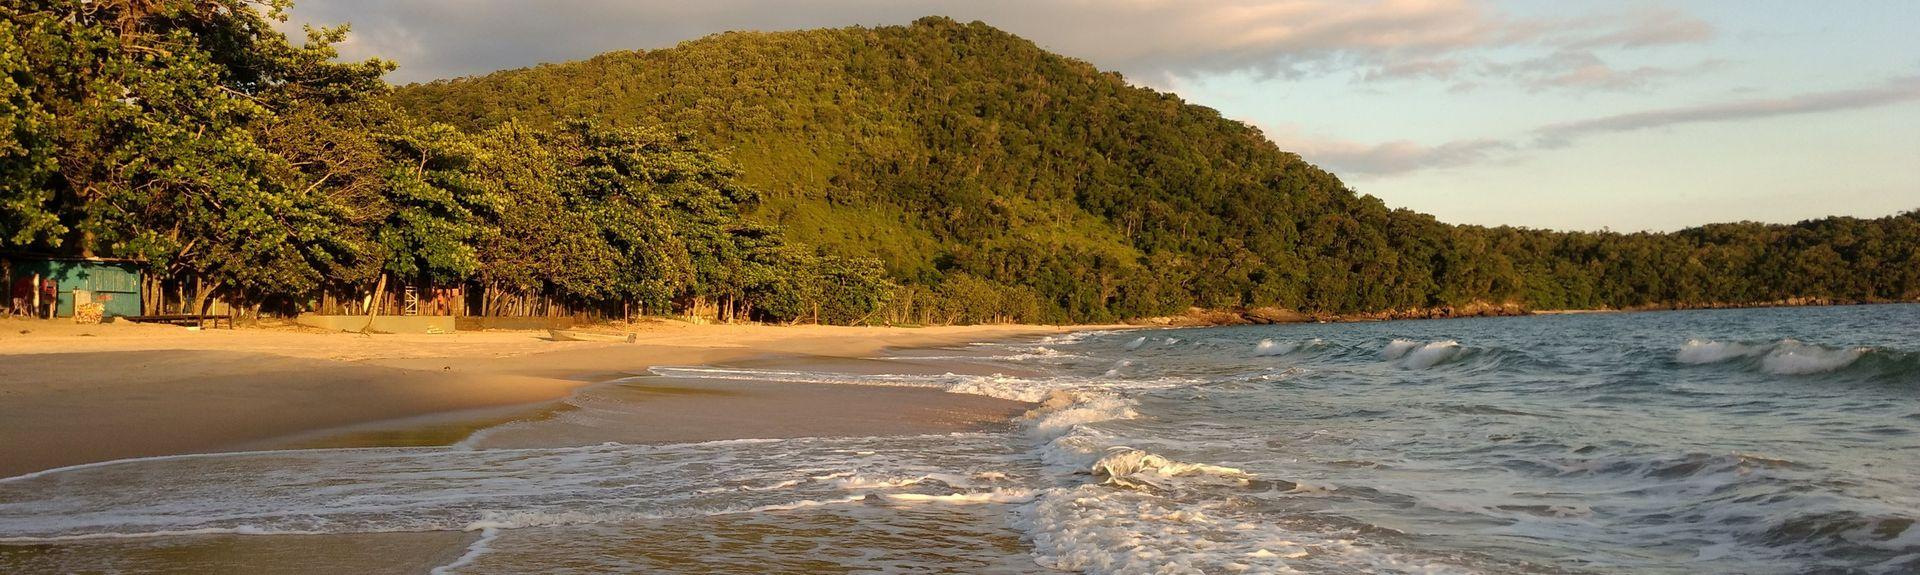 Barra Beach, Ubatuba, Southeast Region, Brazil